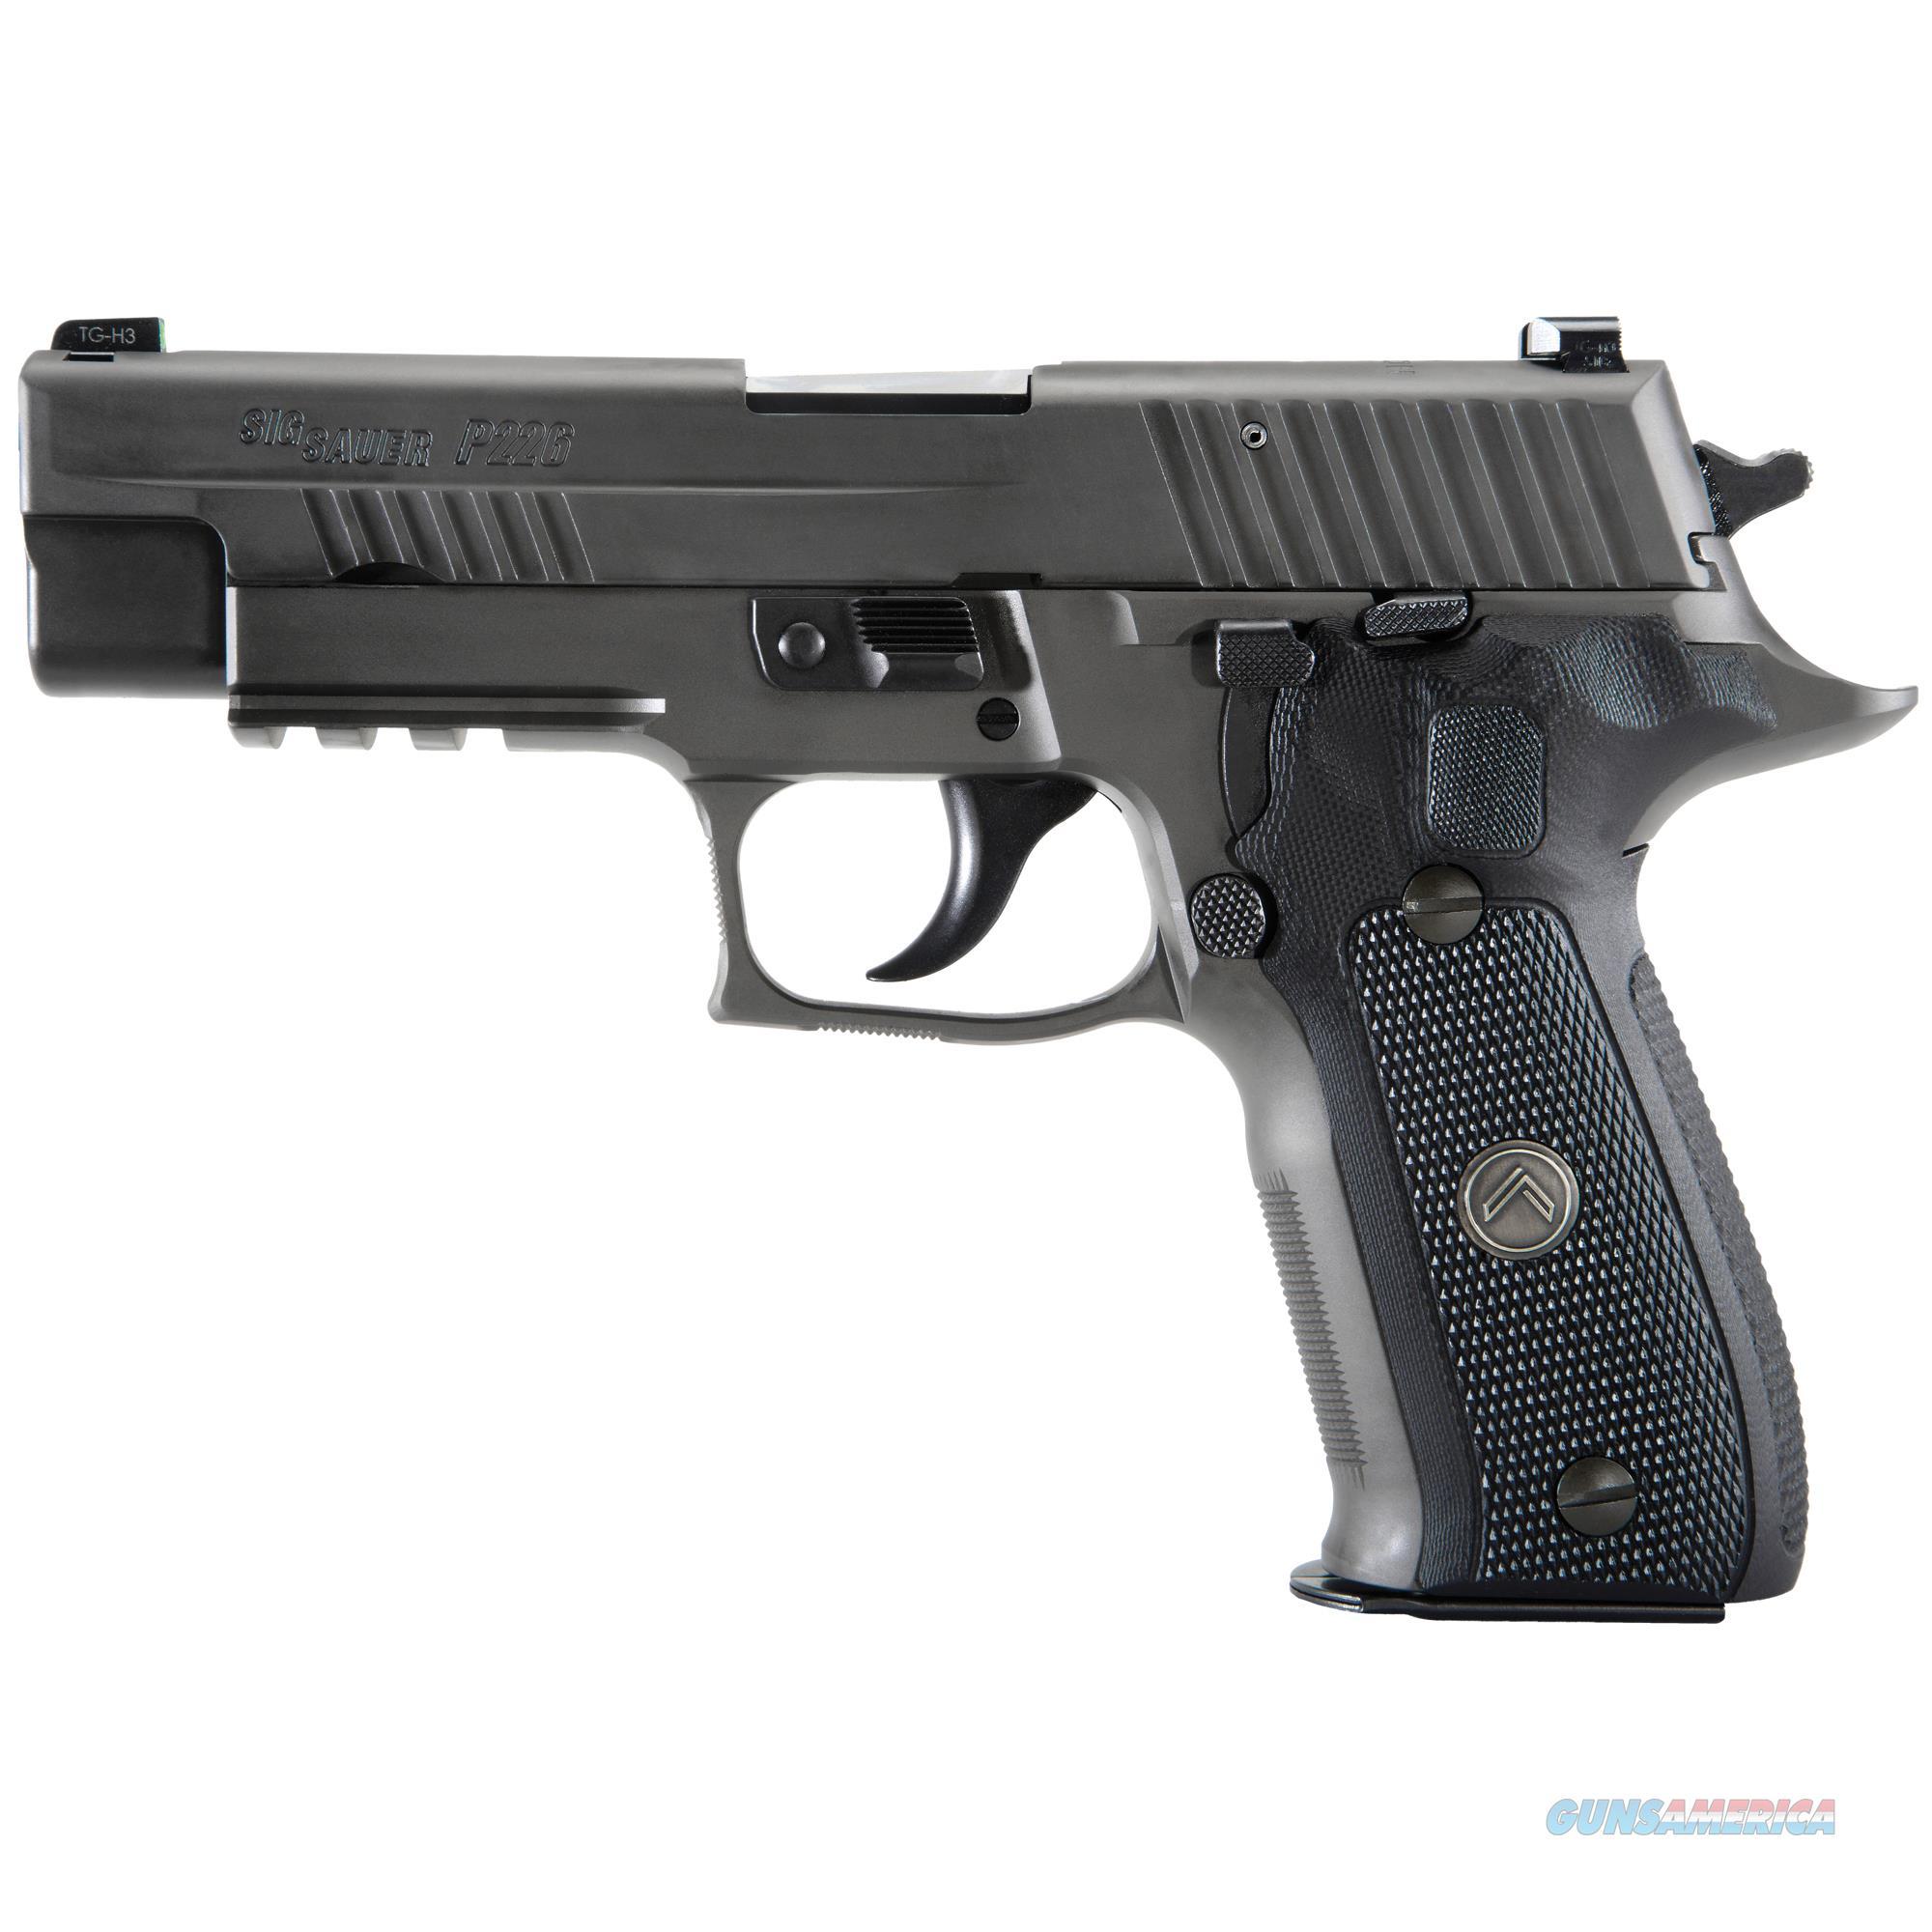 "SIG SAUER P226 LEGION 9MM 4.4"" GRAY 10RD   Guns > Pistols > Sig - Sauer/Sigarms Pistols > P226"